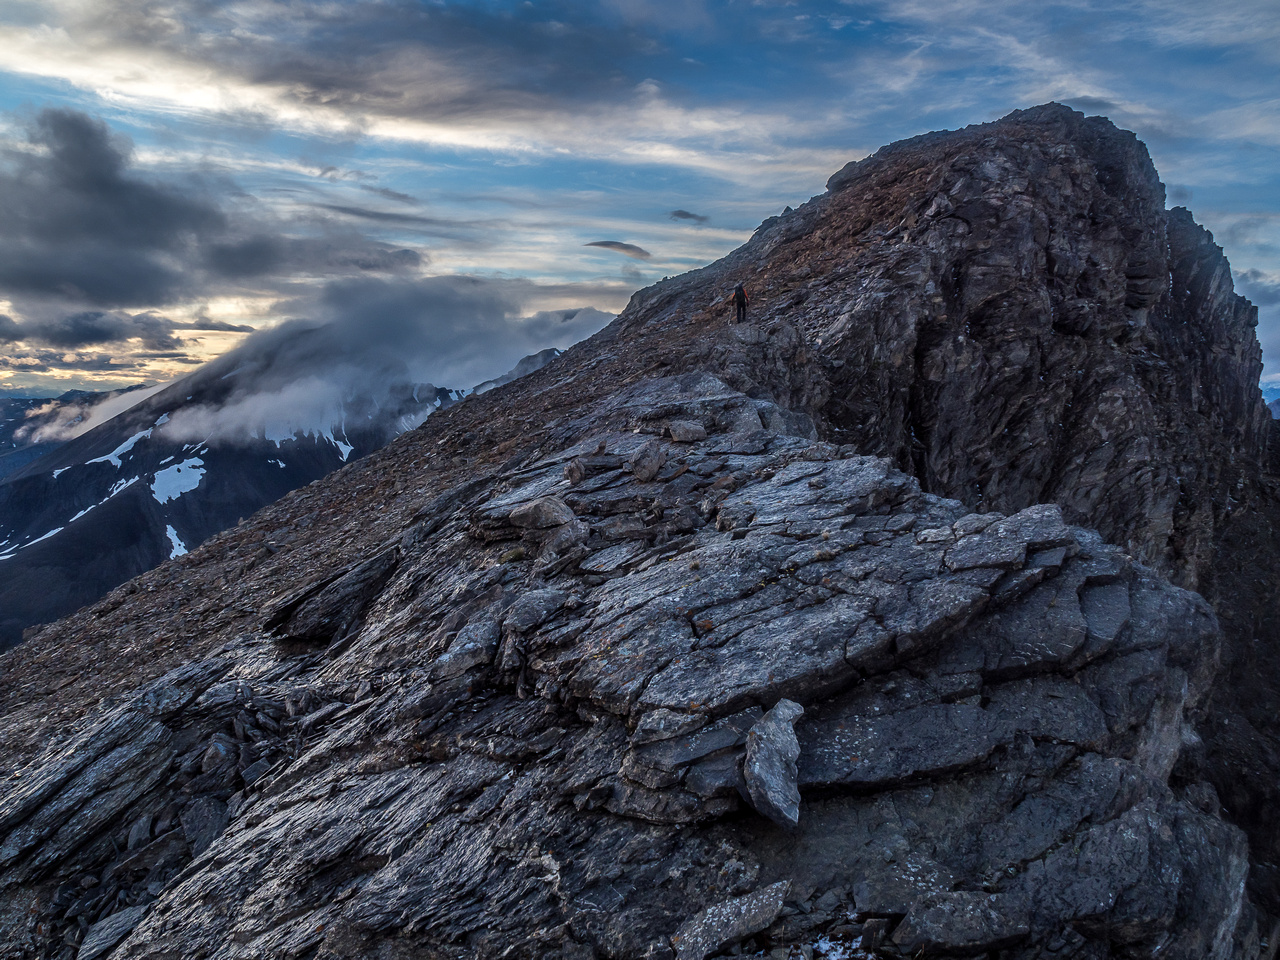 Navigating yet another false summit along the ridge.